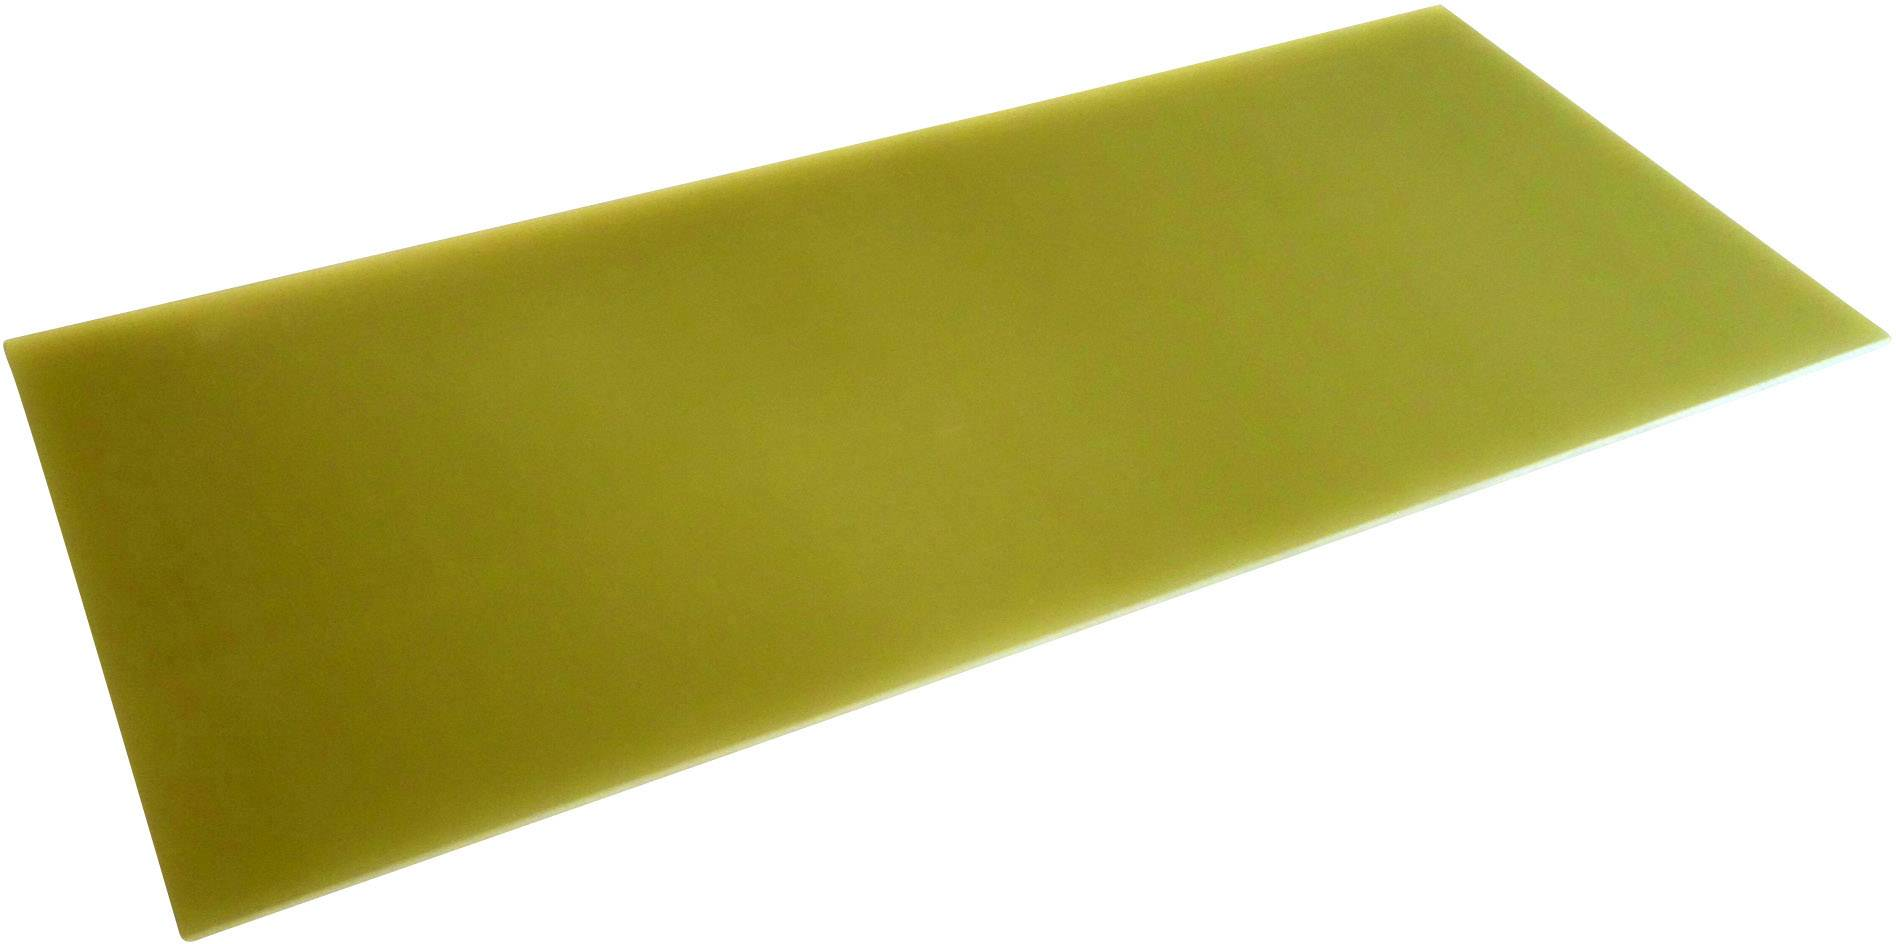 Epoxidová deska Carbotex 150 x 350 x 1 mm